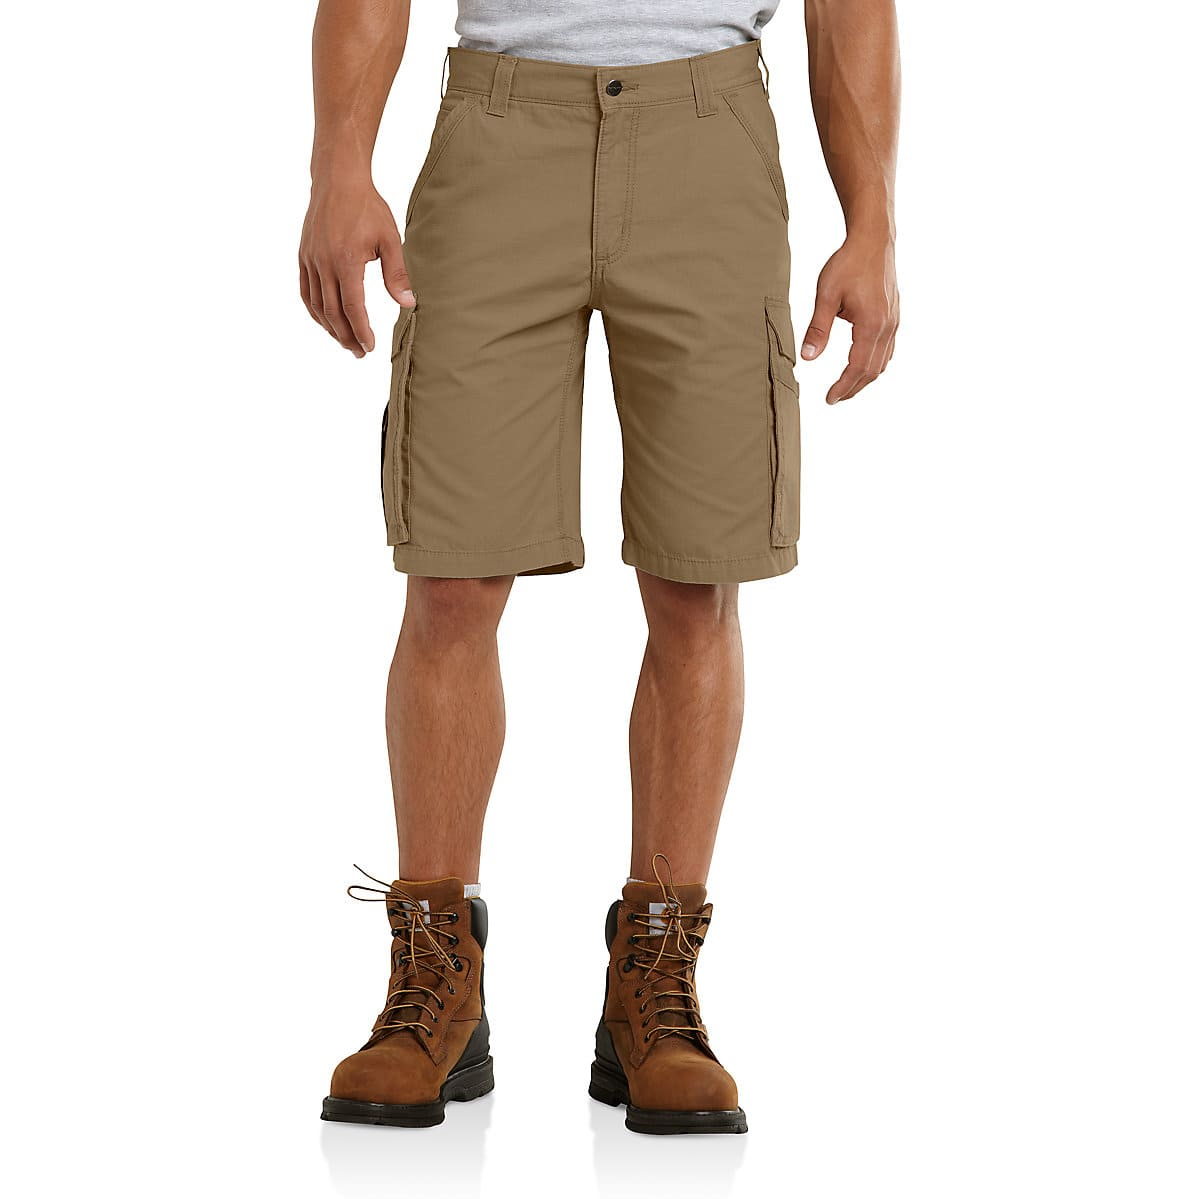 7f3af9cf83 Men's Carhartt Force® Tappen Cargo Short 101168 | Carhartt